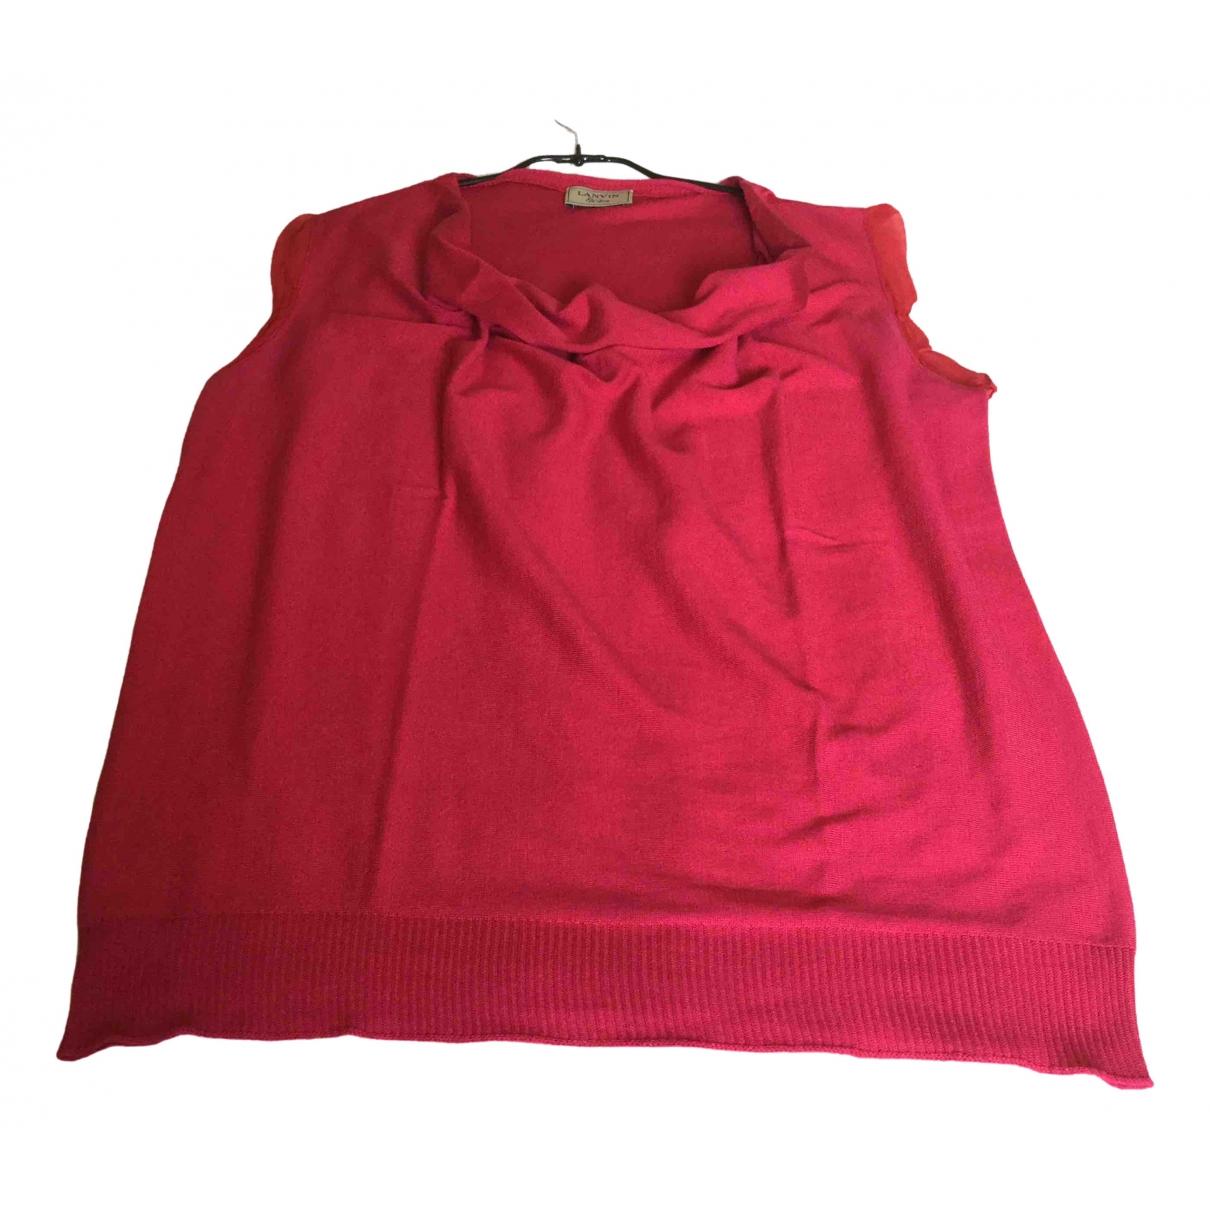 Lanvin \N Red Cotton  top for Women XL International